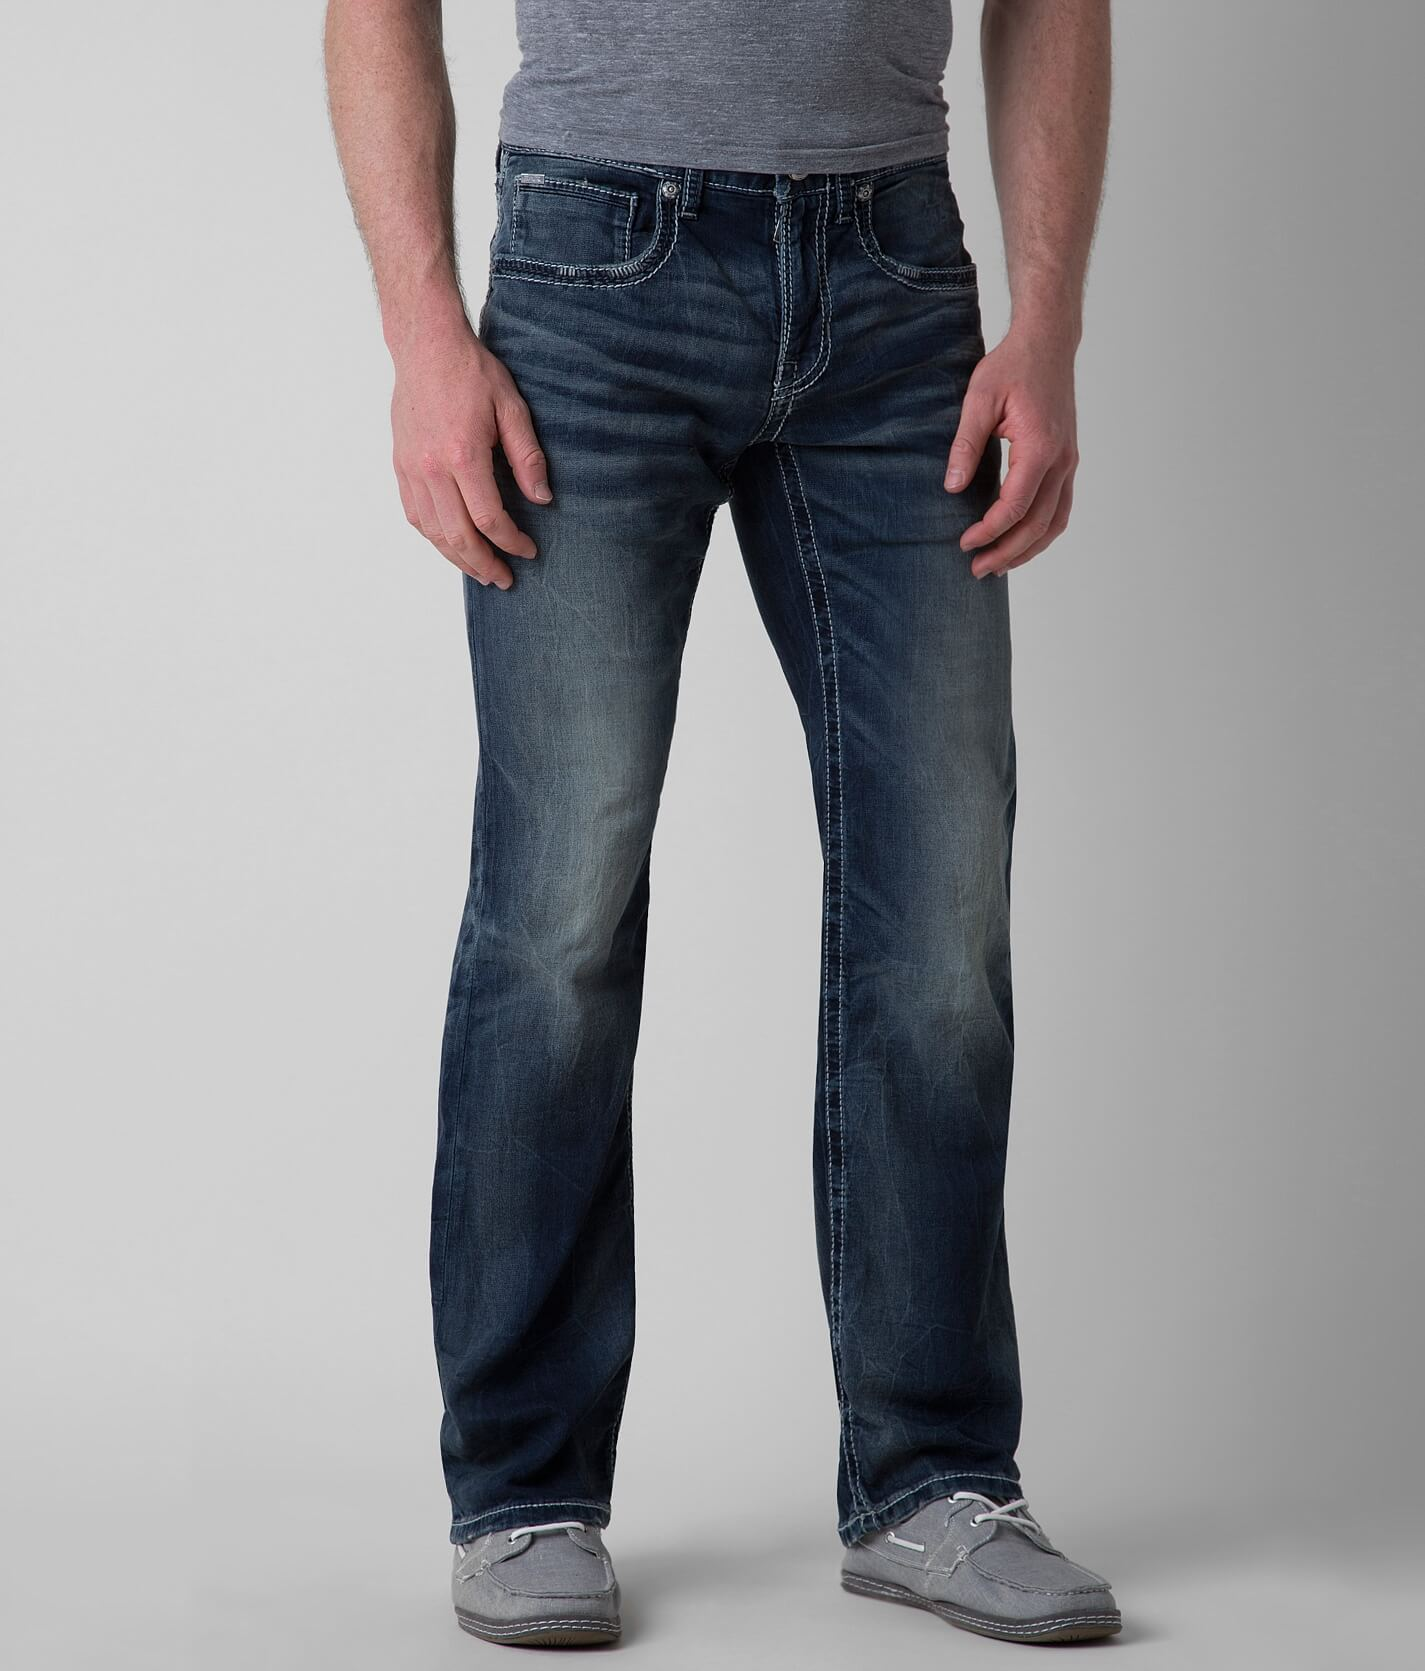 Buckle Black Jeans bVb25q7q